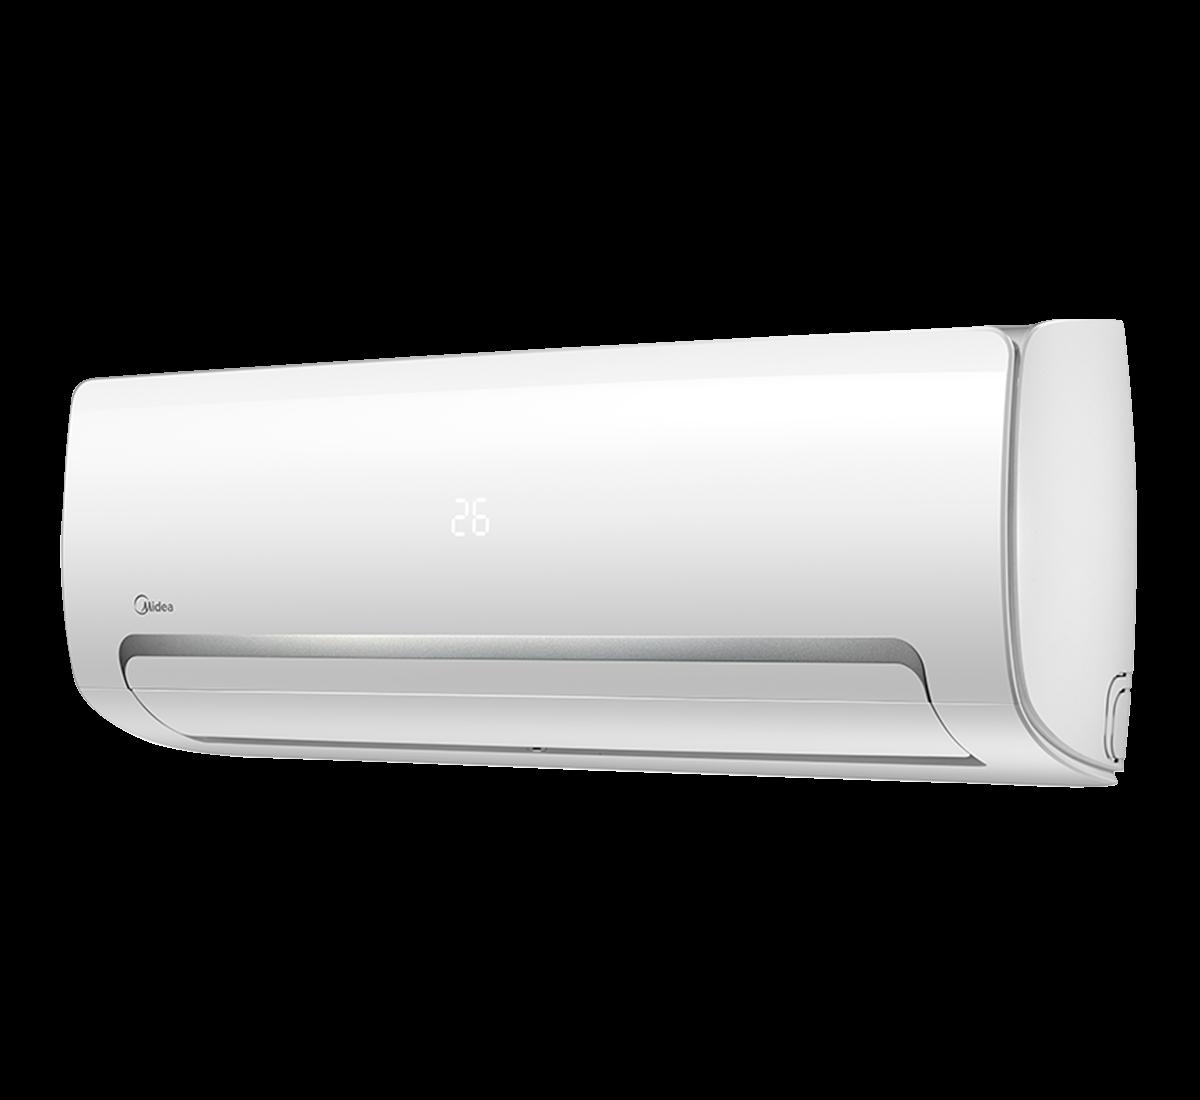 aire acondicionado unidad interior midea inverter msmbbu 12hrfn8 qrd6gw modelo mission ii 3512n8 instalacion incluida caseragua 04